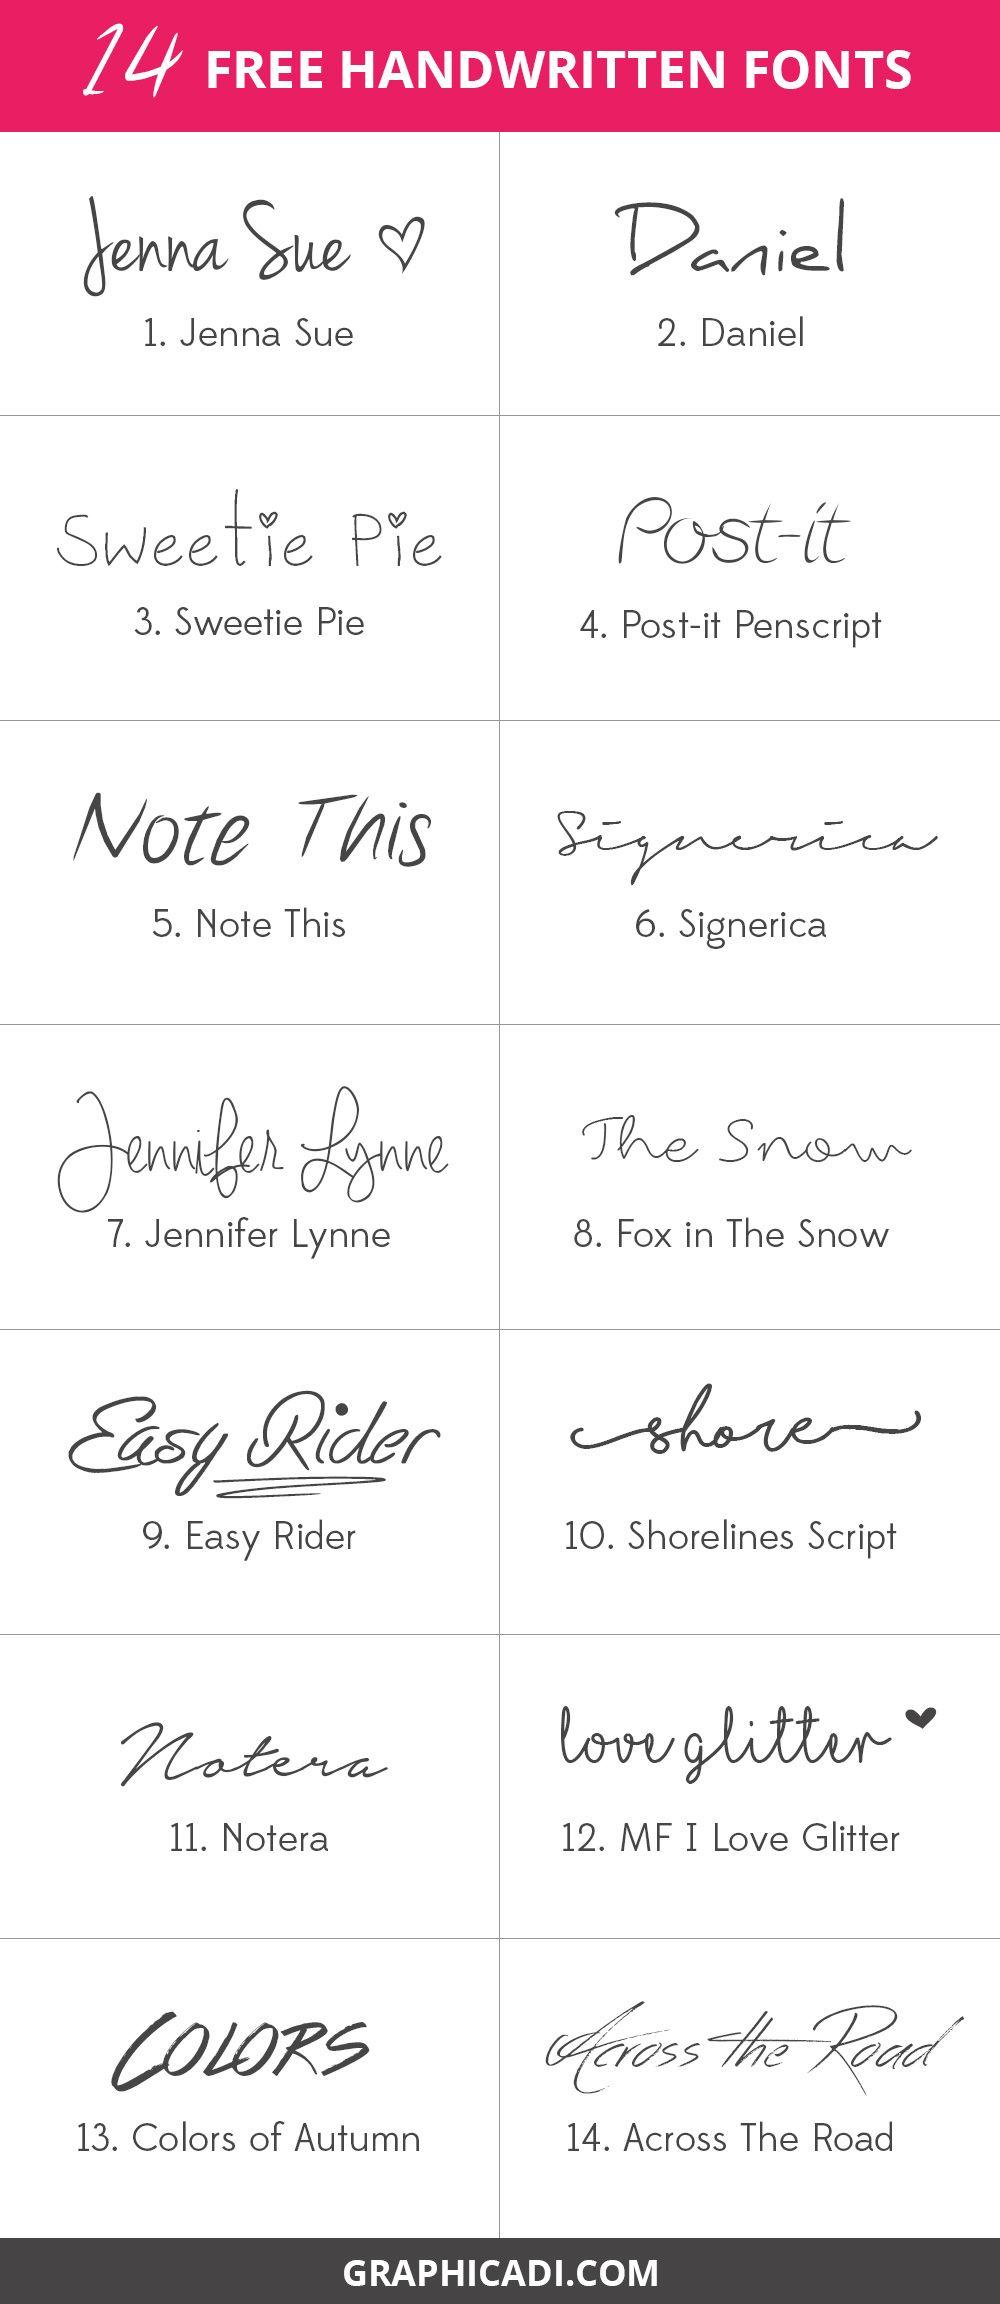 14 Free Handwritten Fonts - Graphicadi